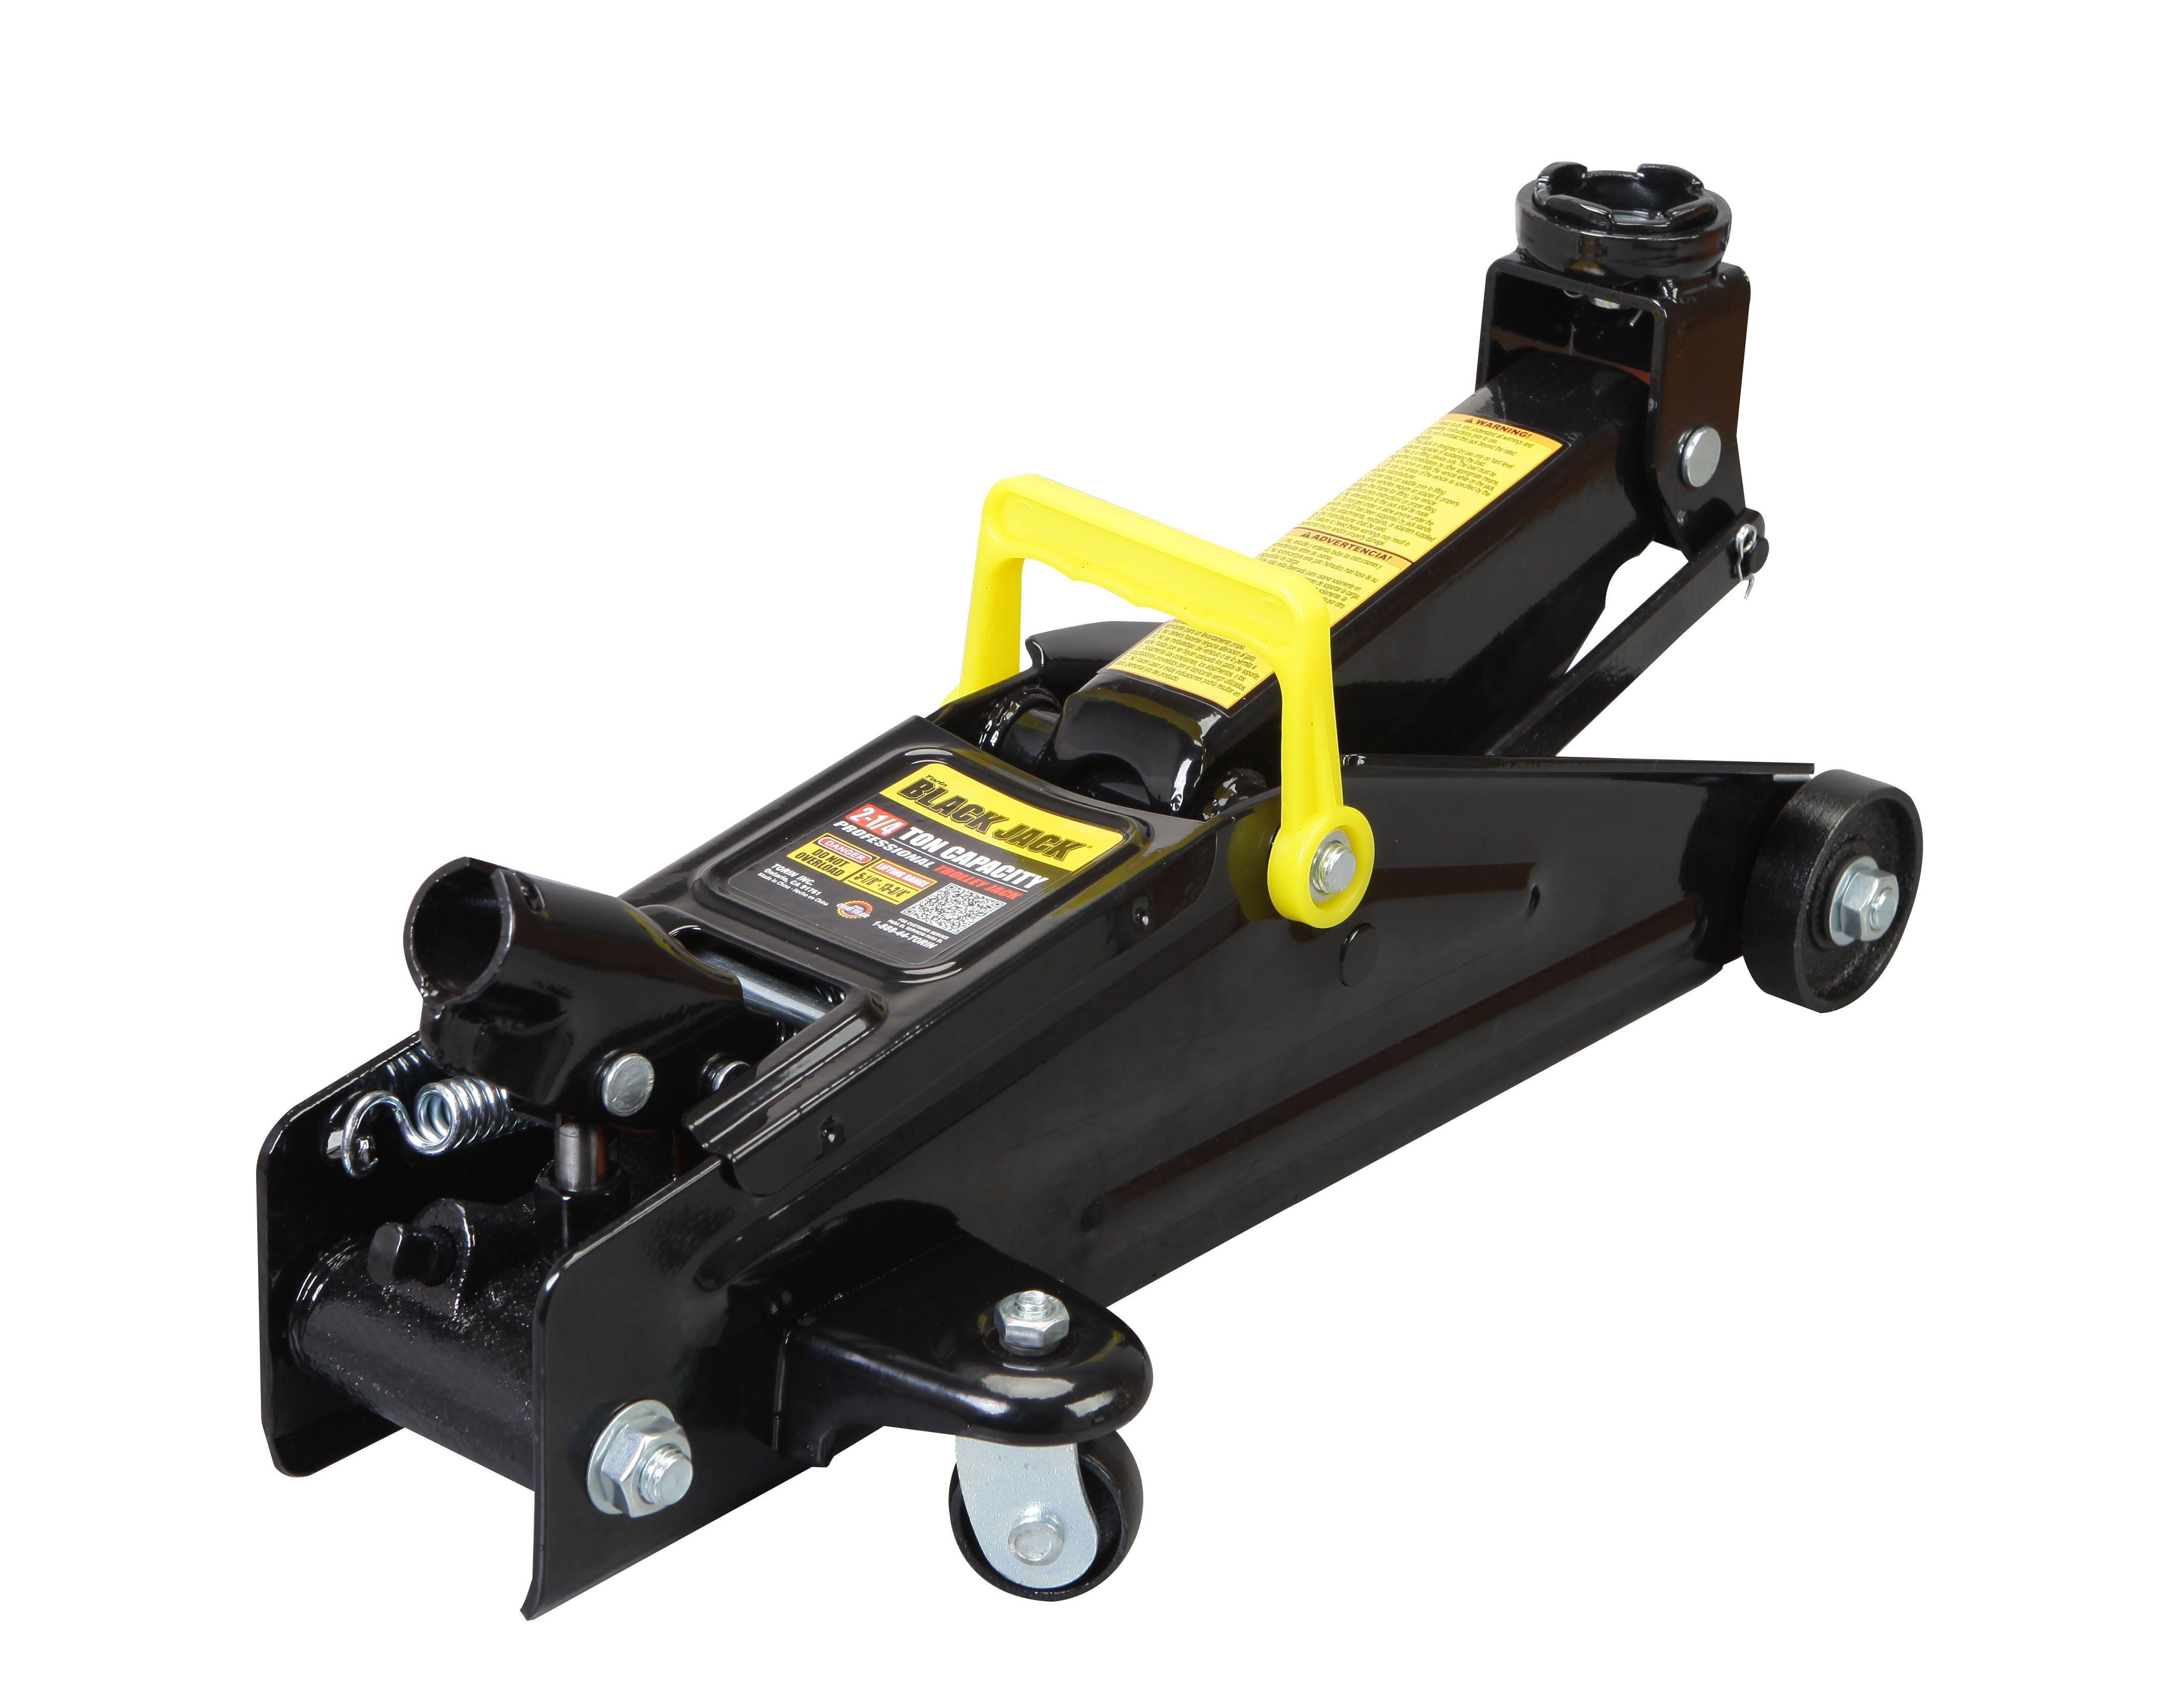 Professional Heavy Duty Metal Torin Trolley Floor Jack and 2 Jack Stands Bundle